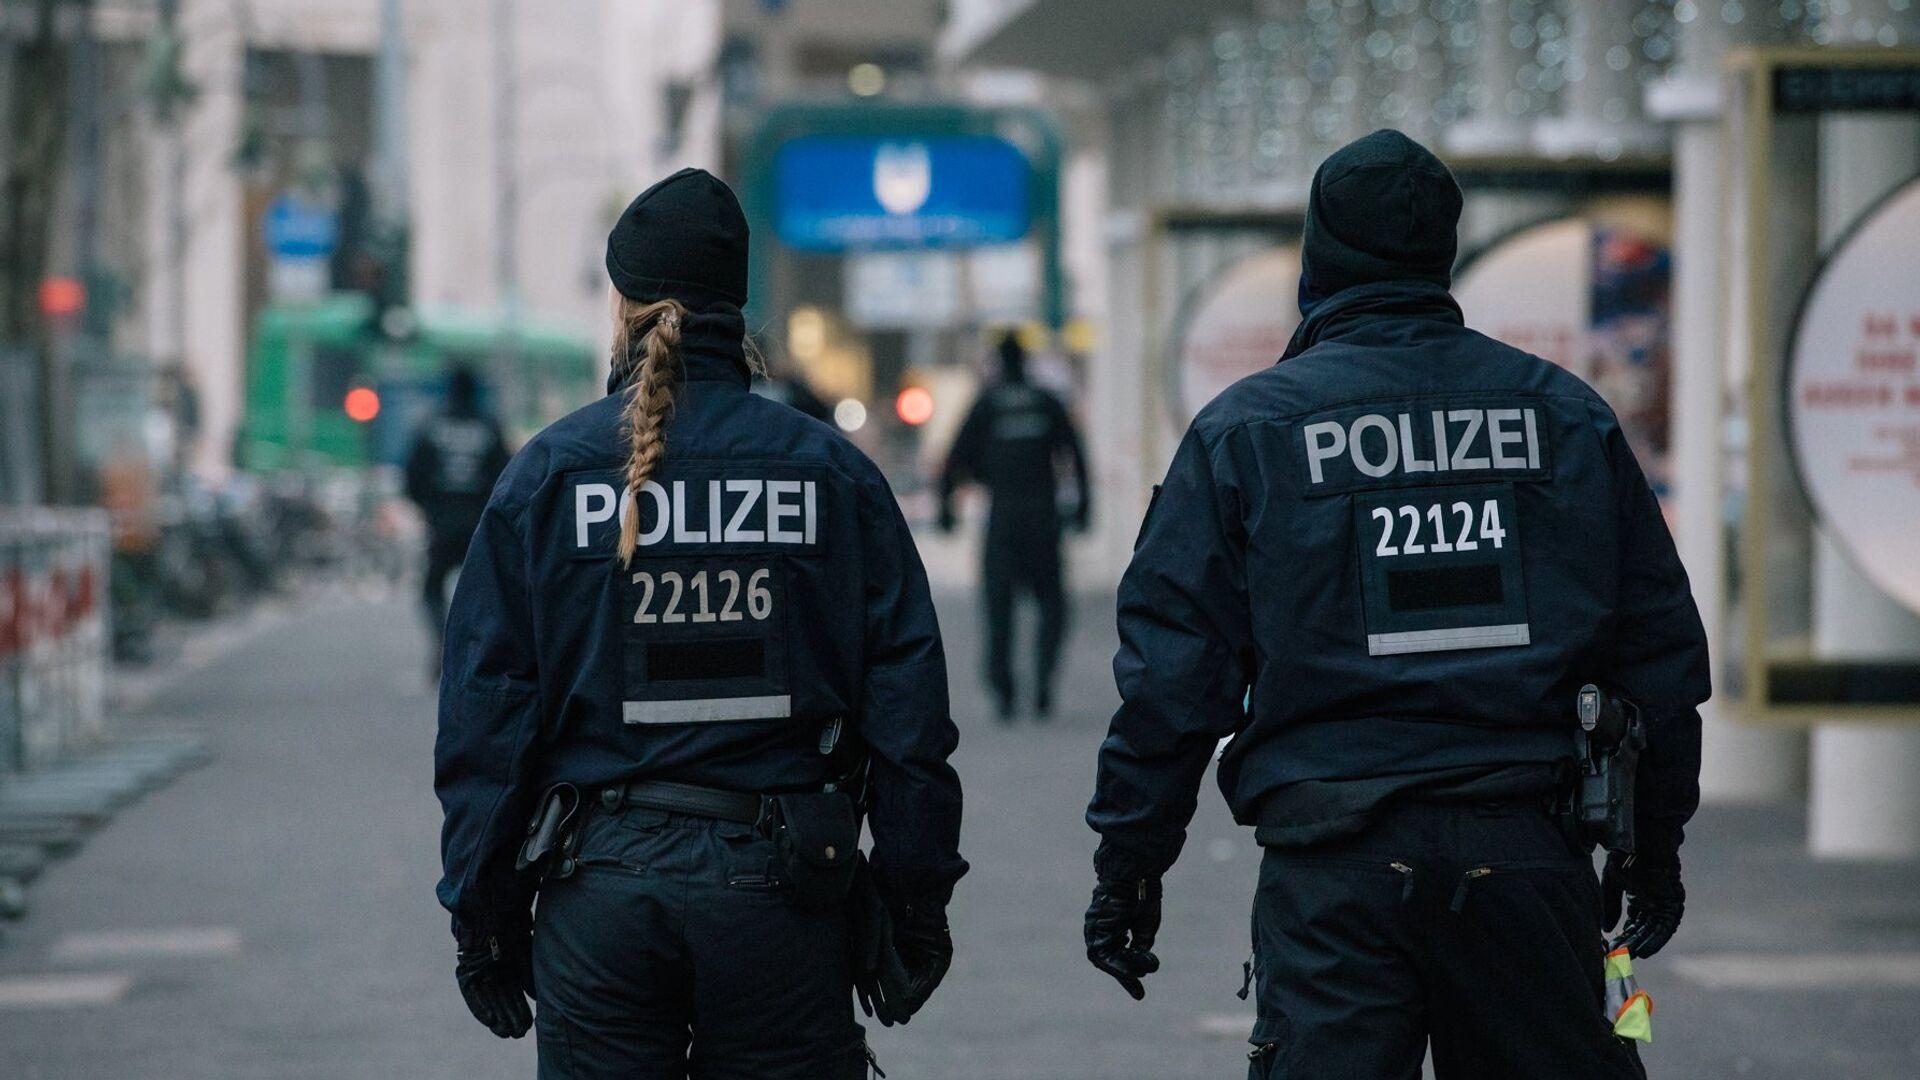 Сотрудники полиции недалеко от места теракта в Берлине - РИА Новости, 1920, 03.05.2021